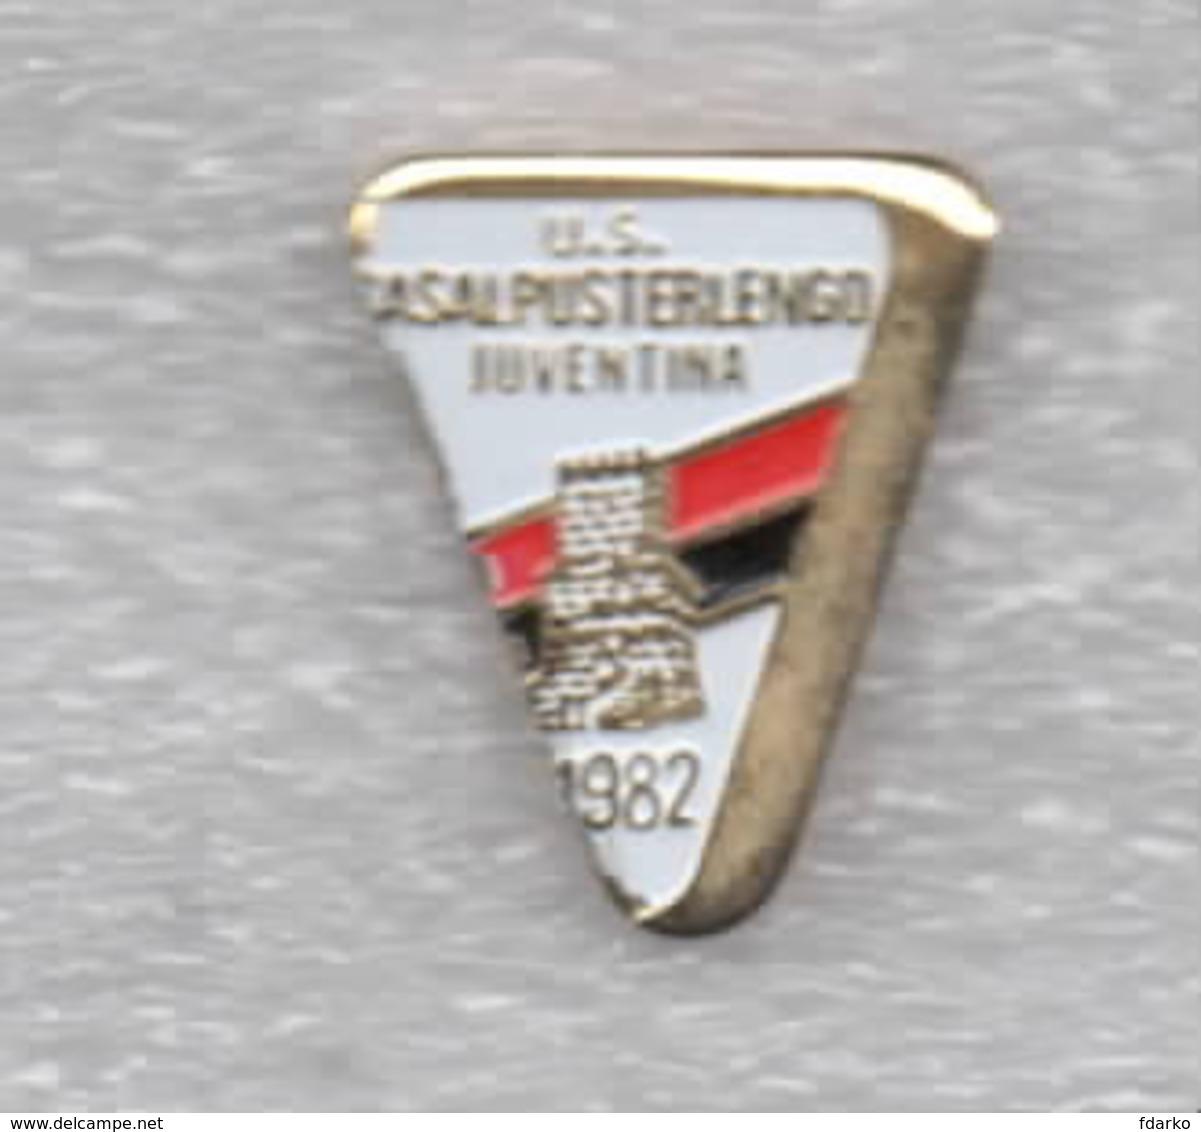 1/3 U.S. Casalpusterlengo Juventina Calcio Distintivi FootBall Soccer Spilla Pins  Italy Lombardia Lodi - Calcio